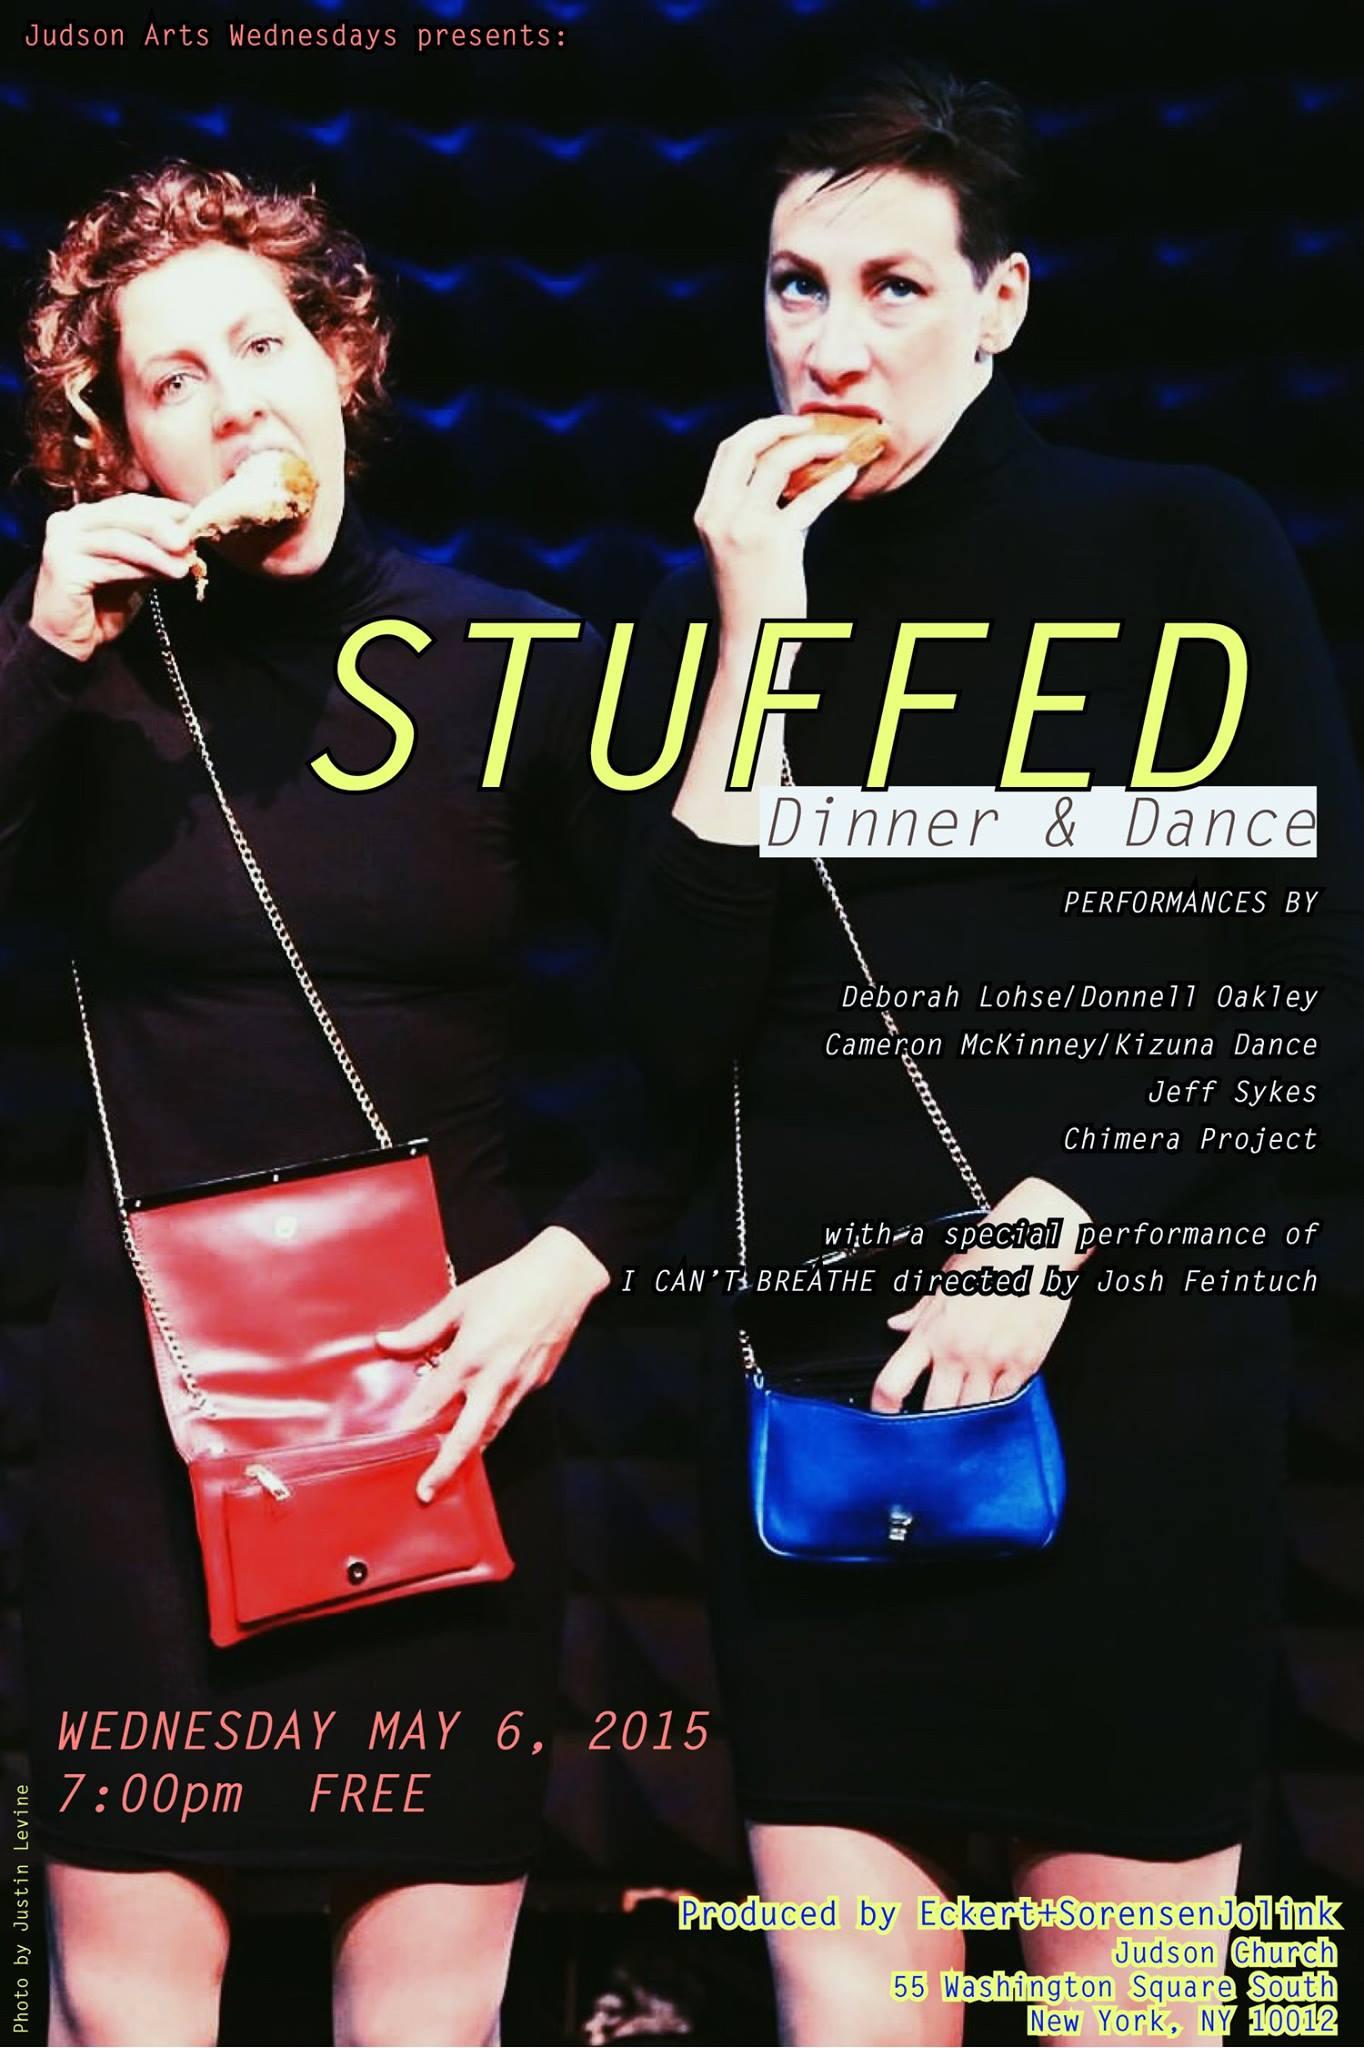 STUFFED_15.jpg